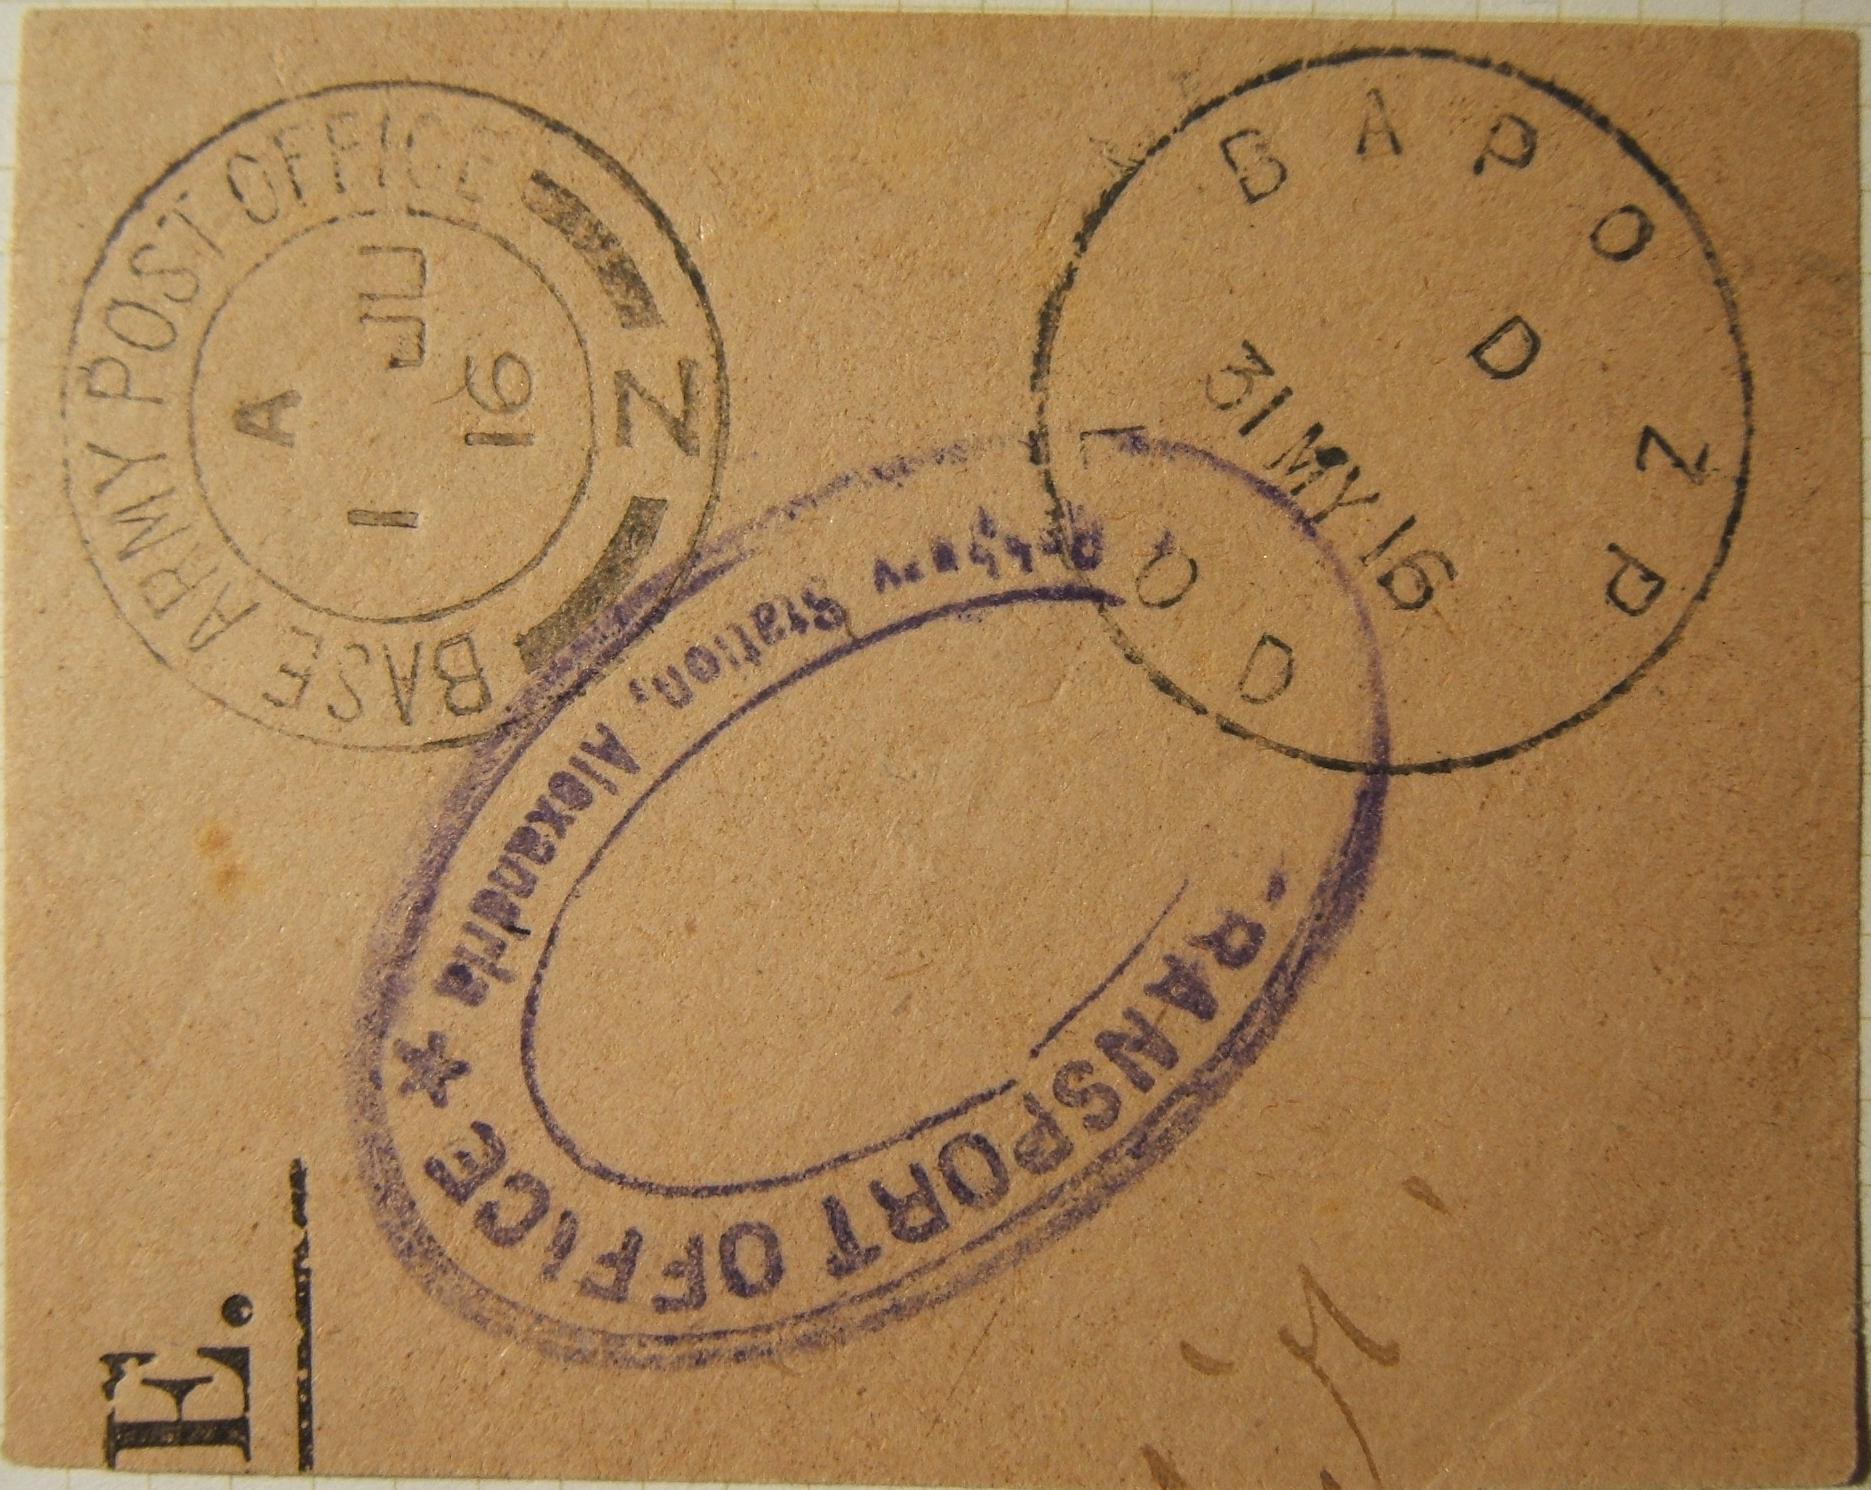 5/1916 WWI מצרים צבא צבאי בריטי לא רשום BAPO ZP Lod חותמת על חתיכה